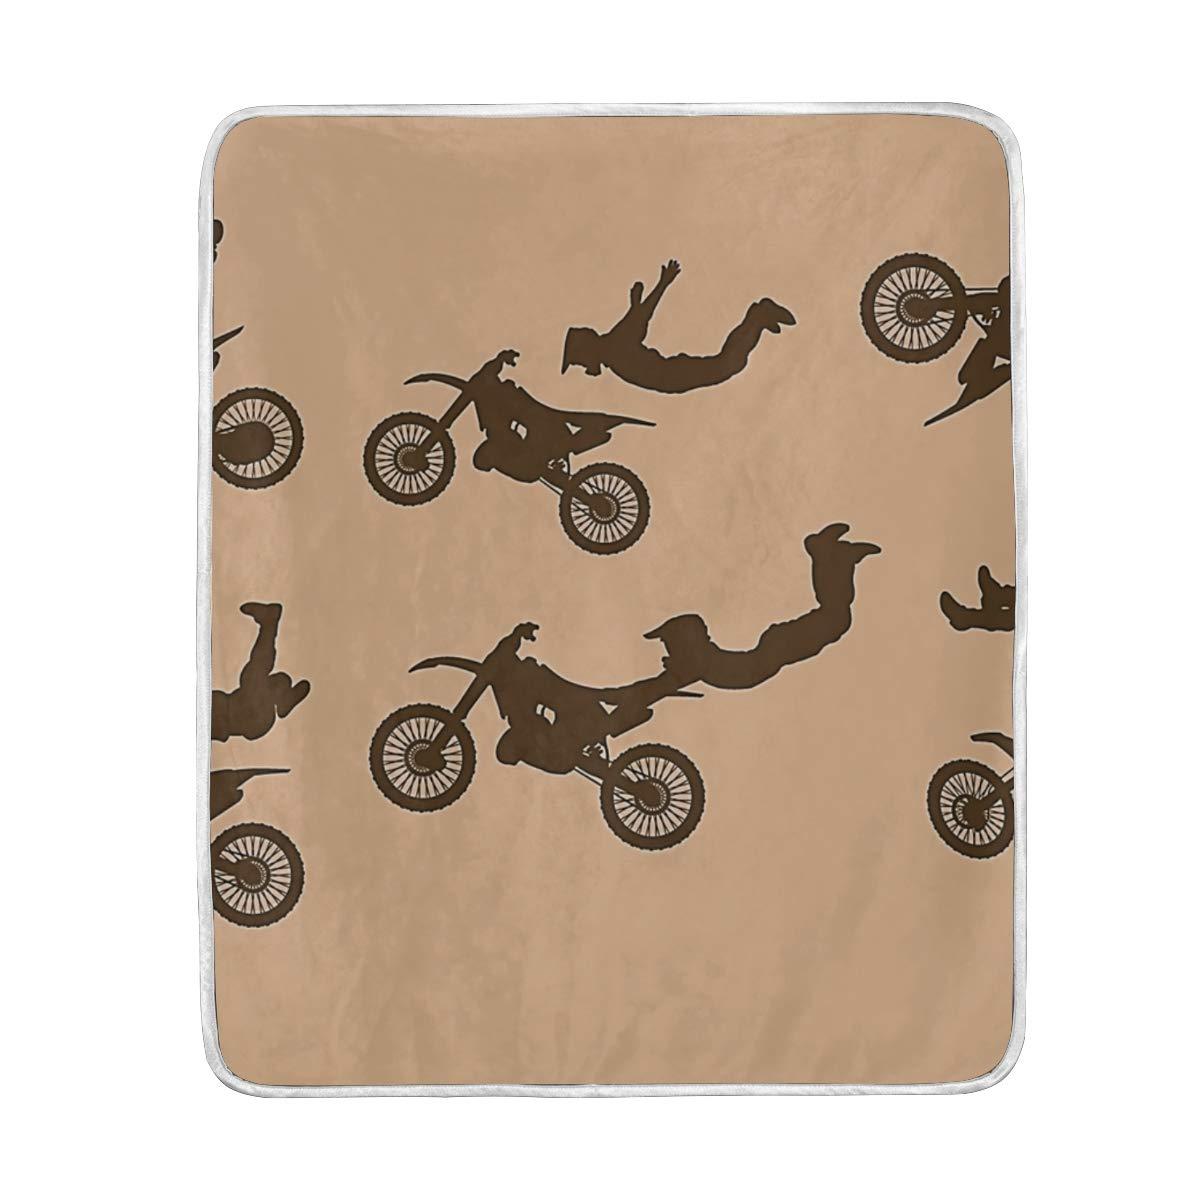 Amazon com: Luxury Fleece Woolen Blanket,Dirt Bikes Free Stitched